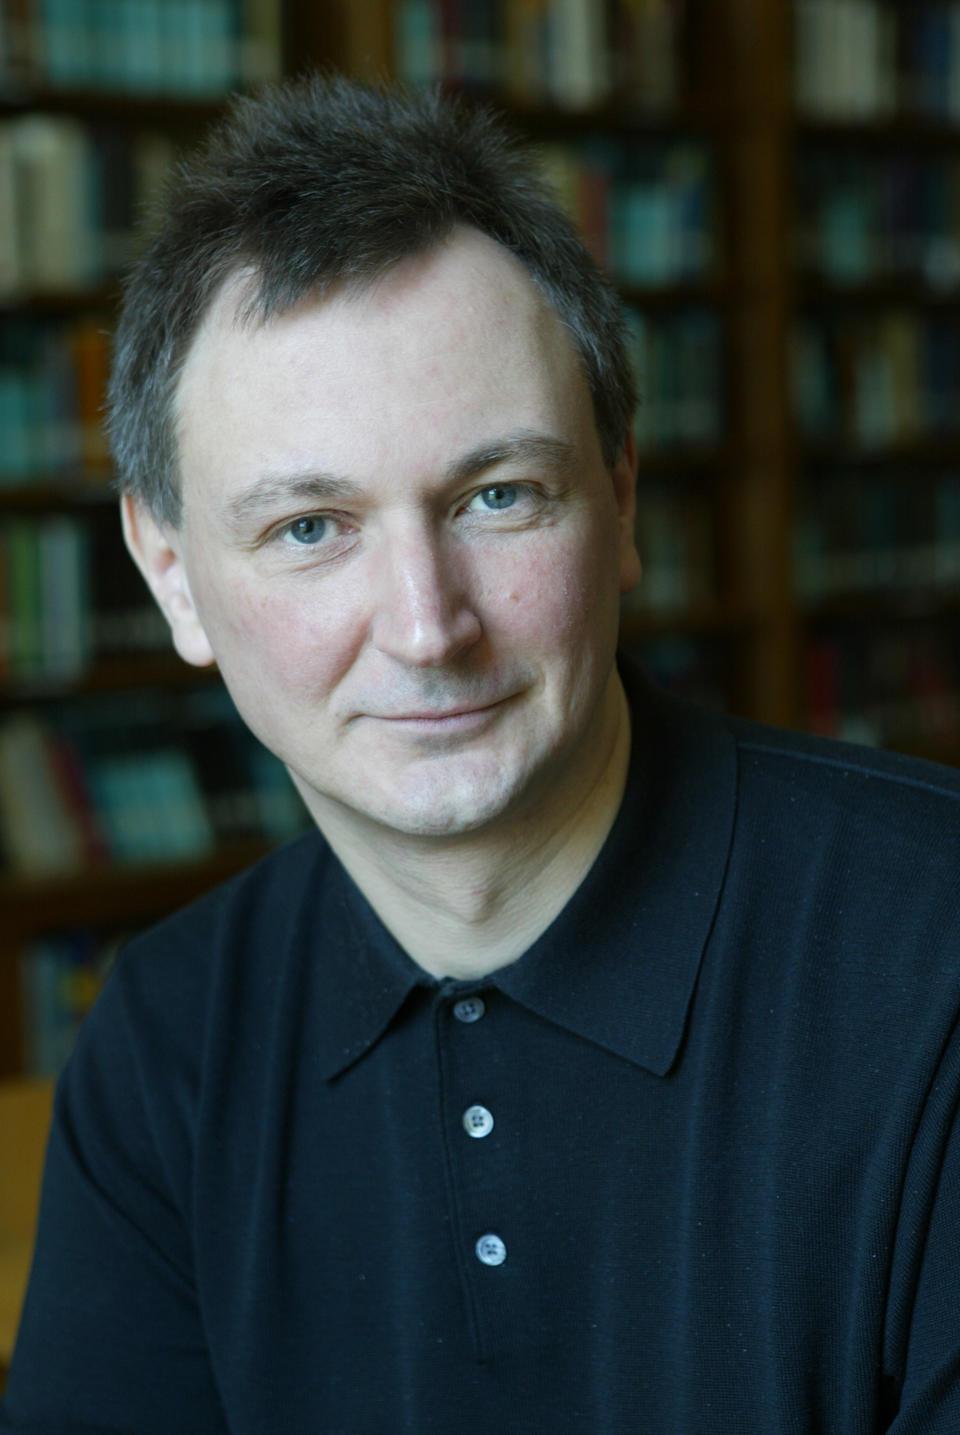 Scomparsa a soli 51 anni di Vladimir Voevodsky, medaglia Fields 2002